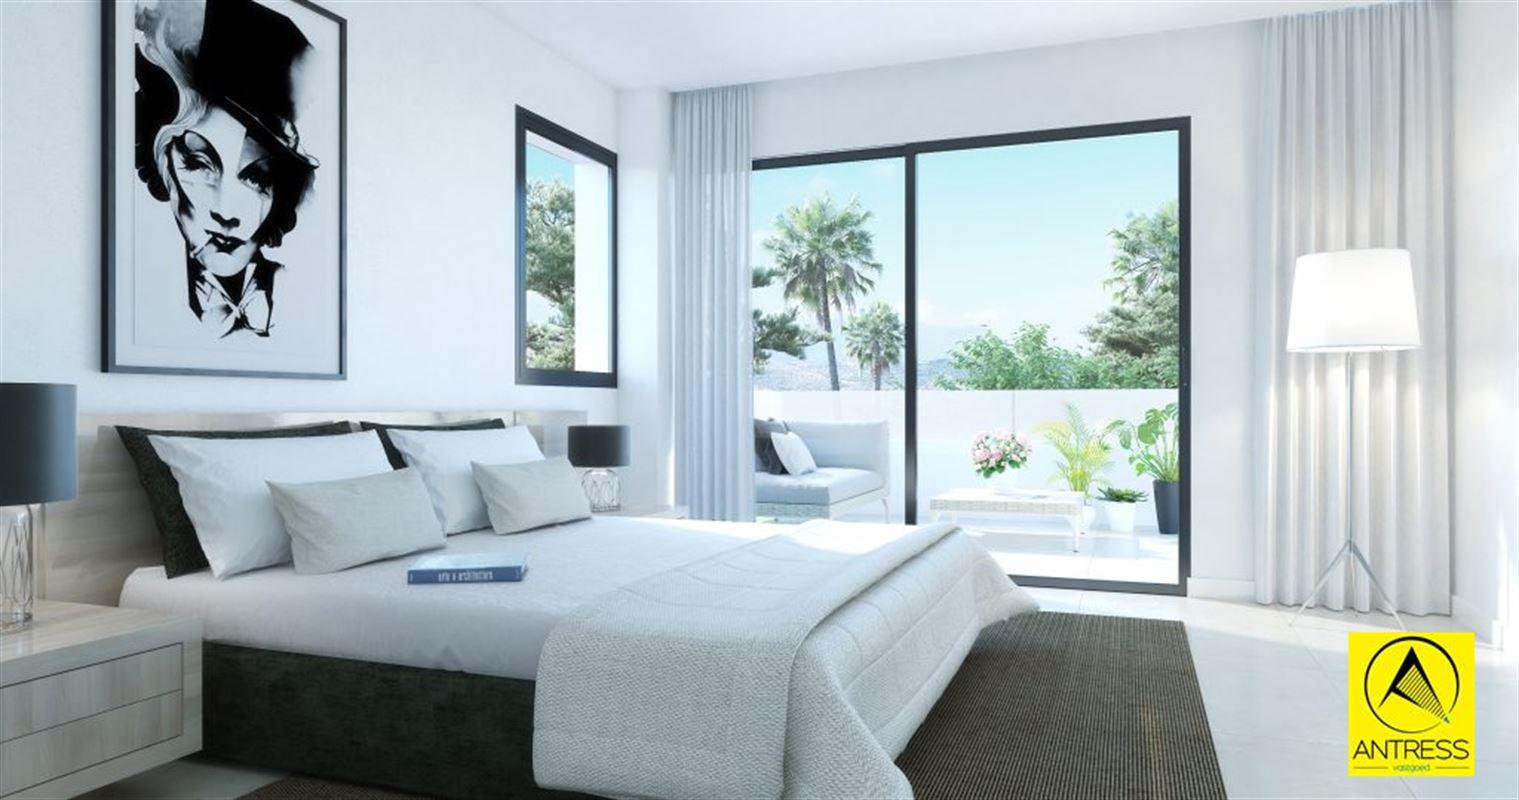 Foto 4 : Huis te 29688 ESTEPONA (Spanje) - Prijs € 345.000